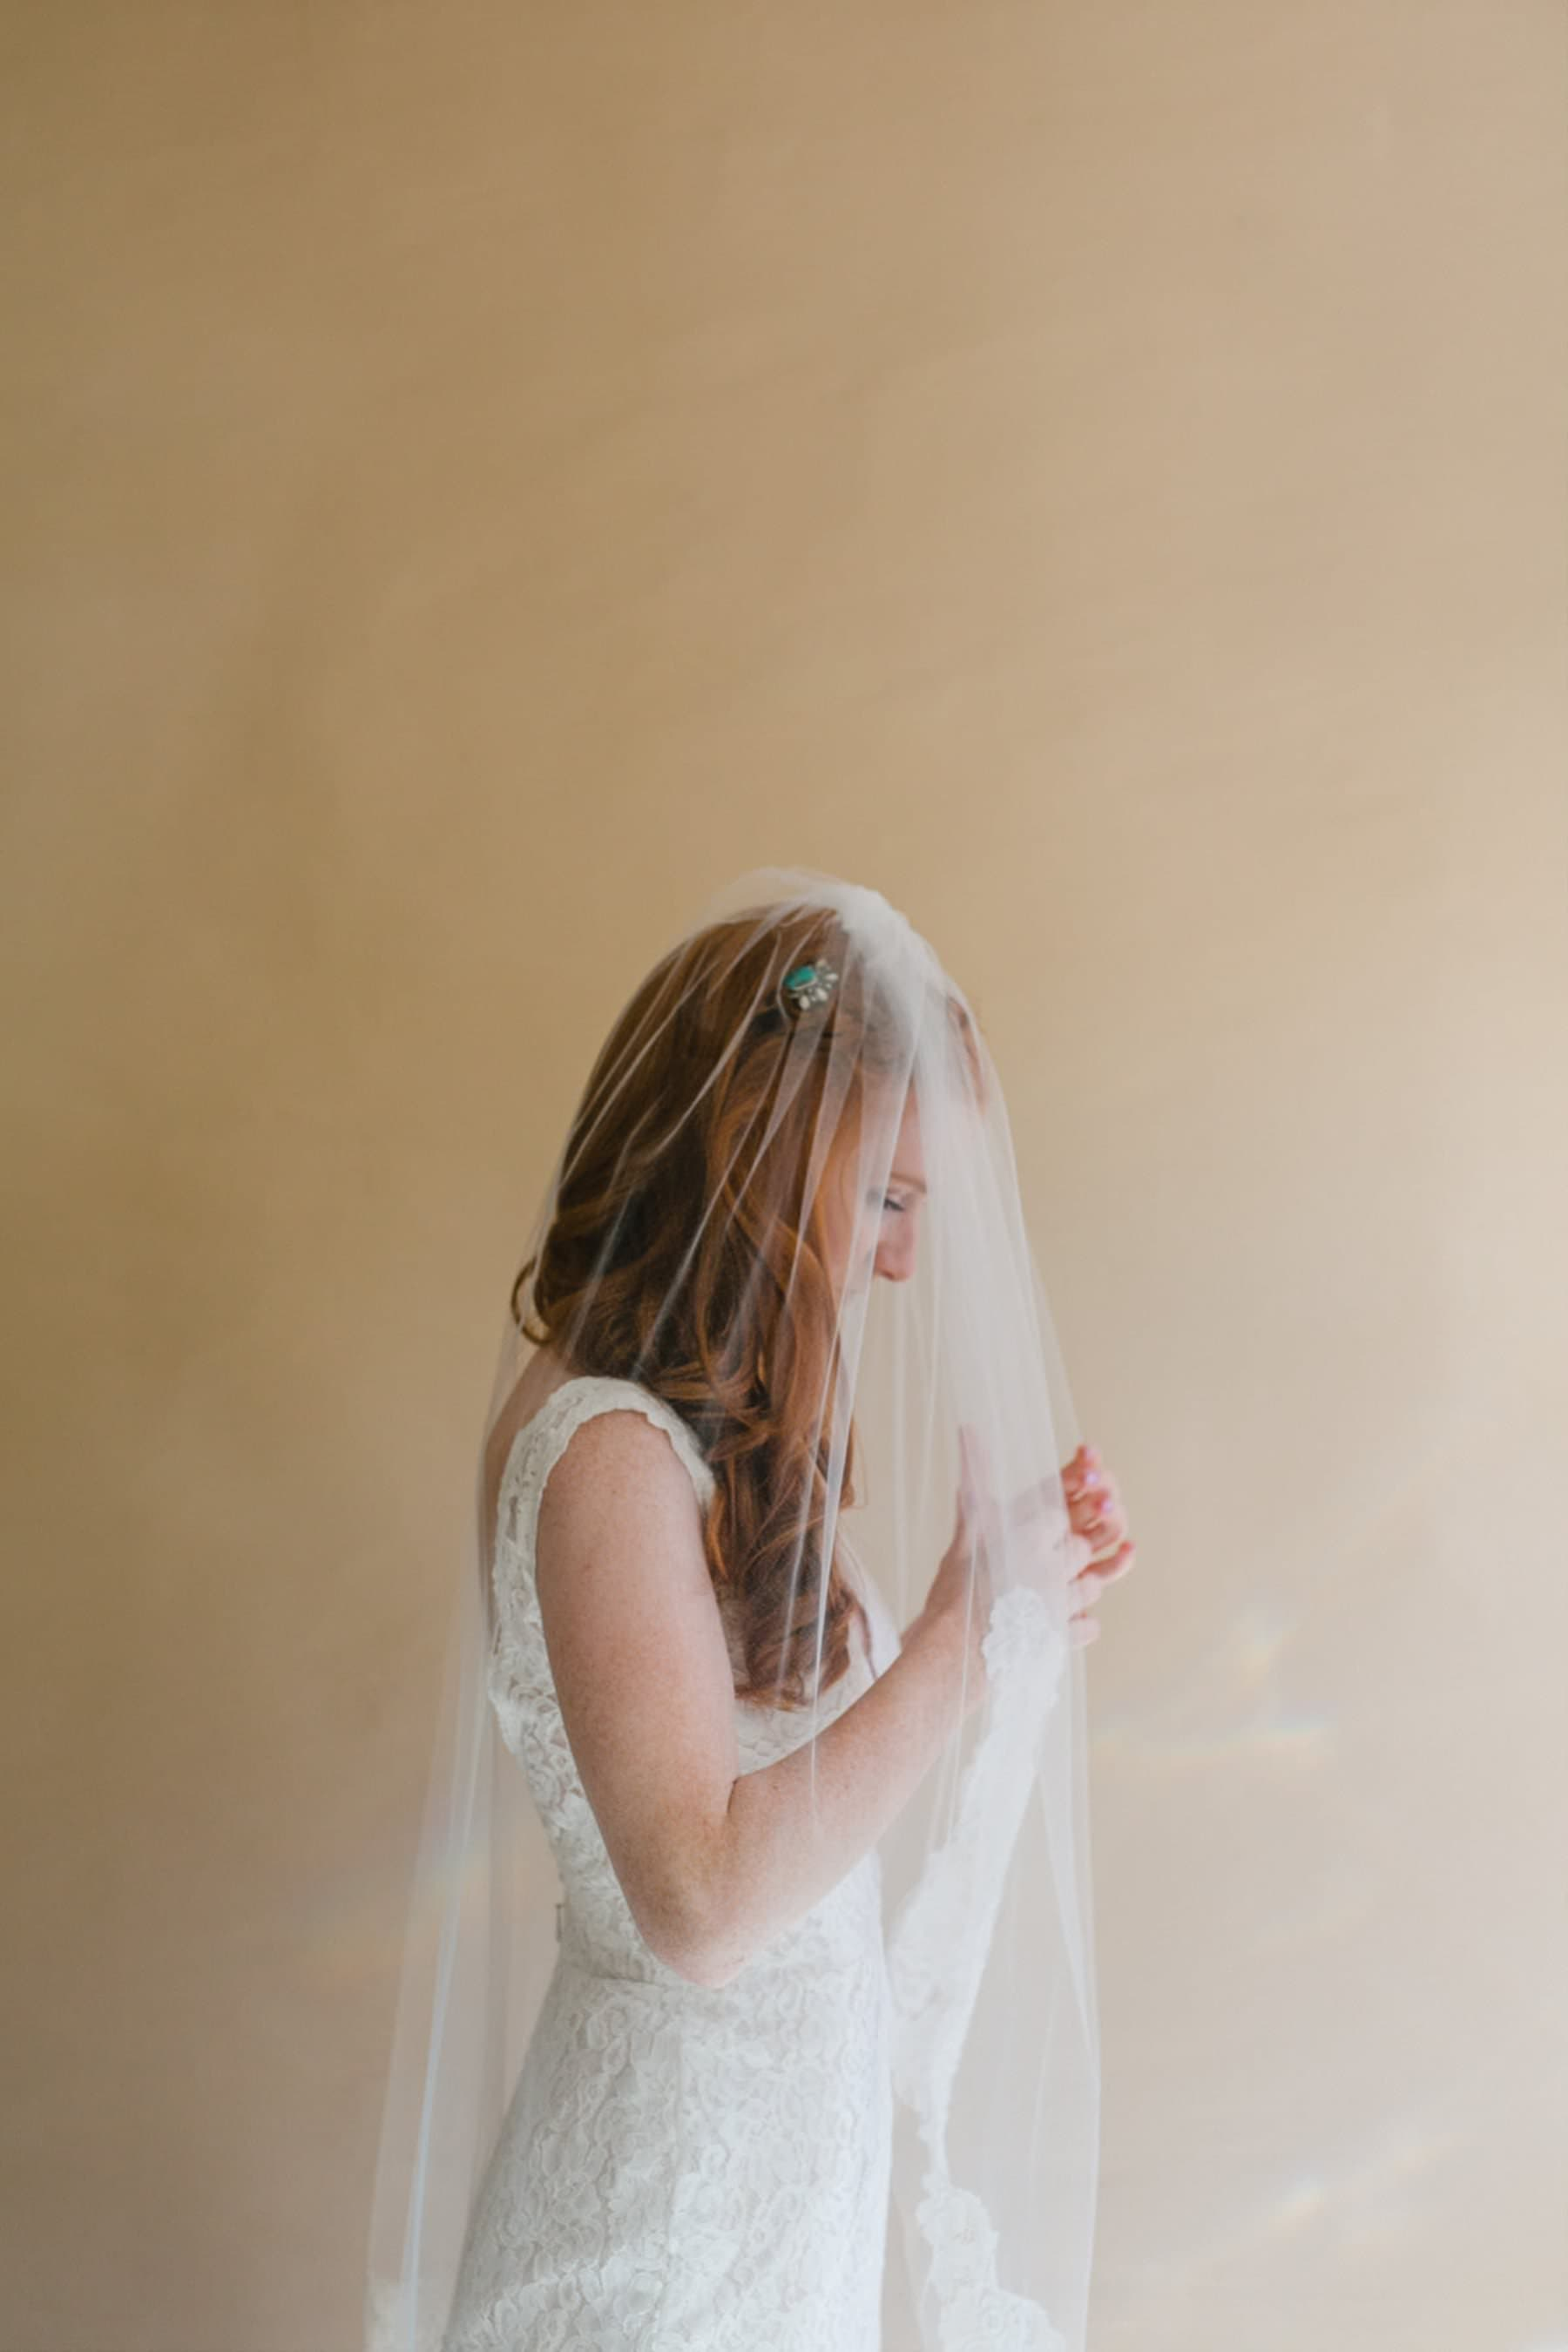 redhead bride with veil Arizona wedding photographer Alyssa Campbell Photography